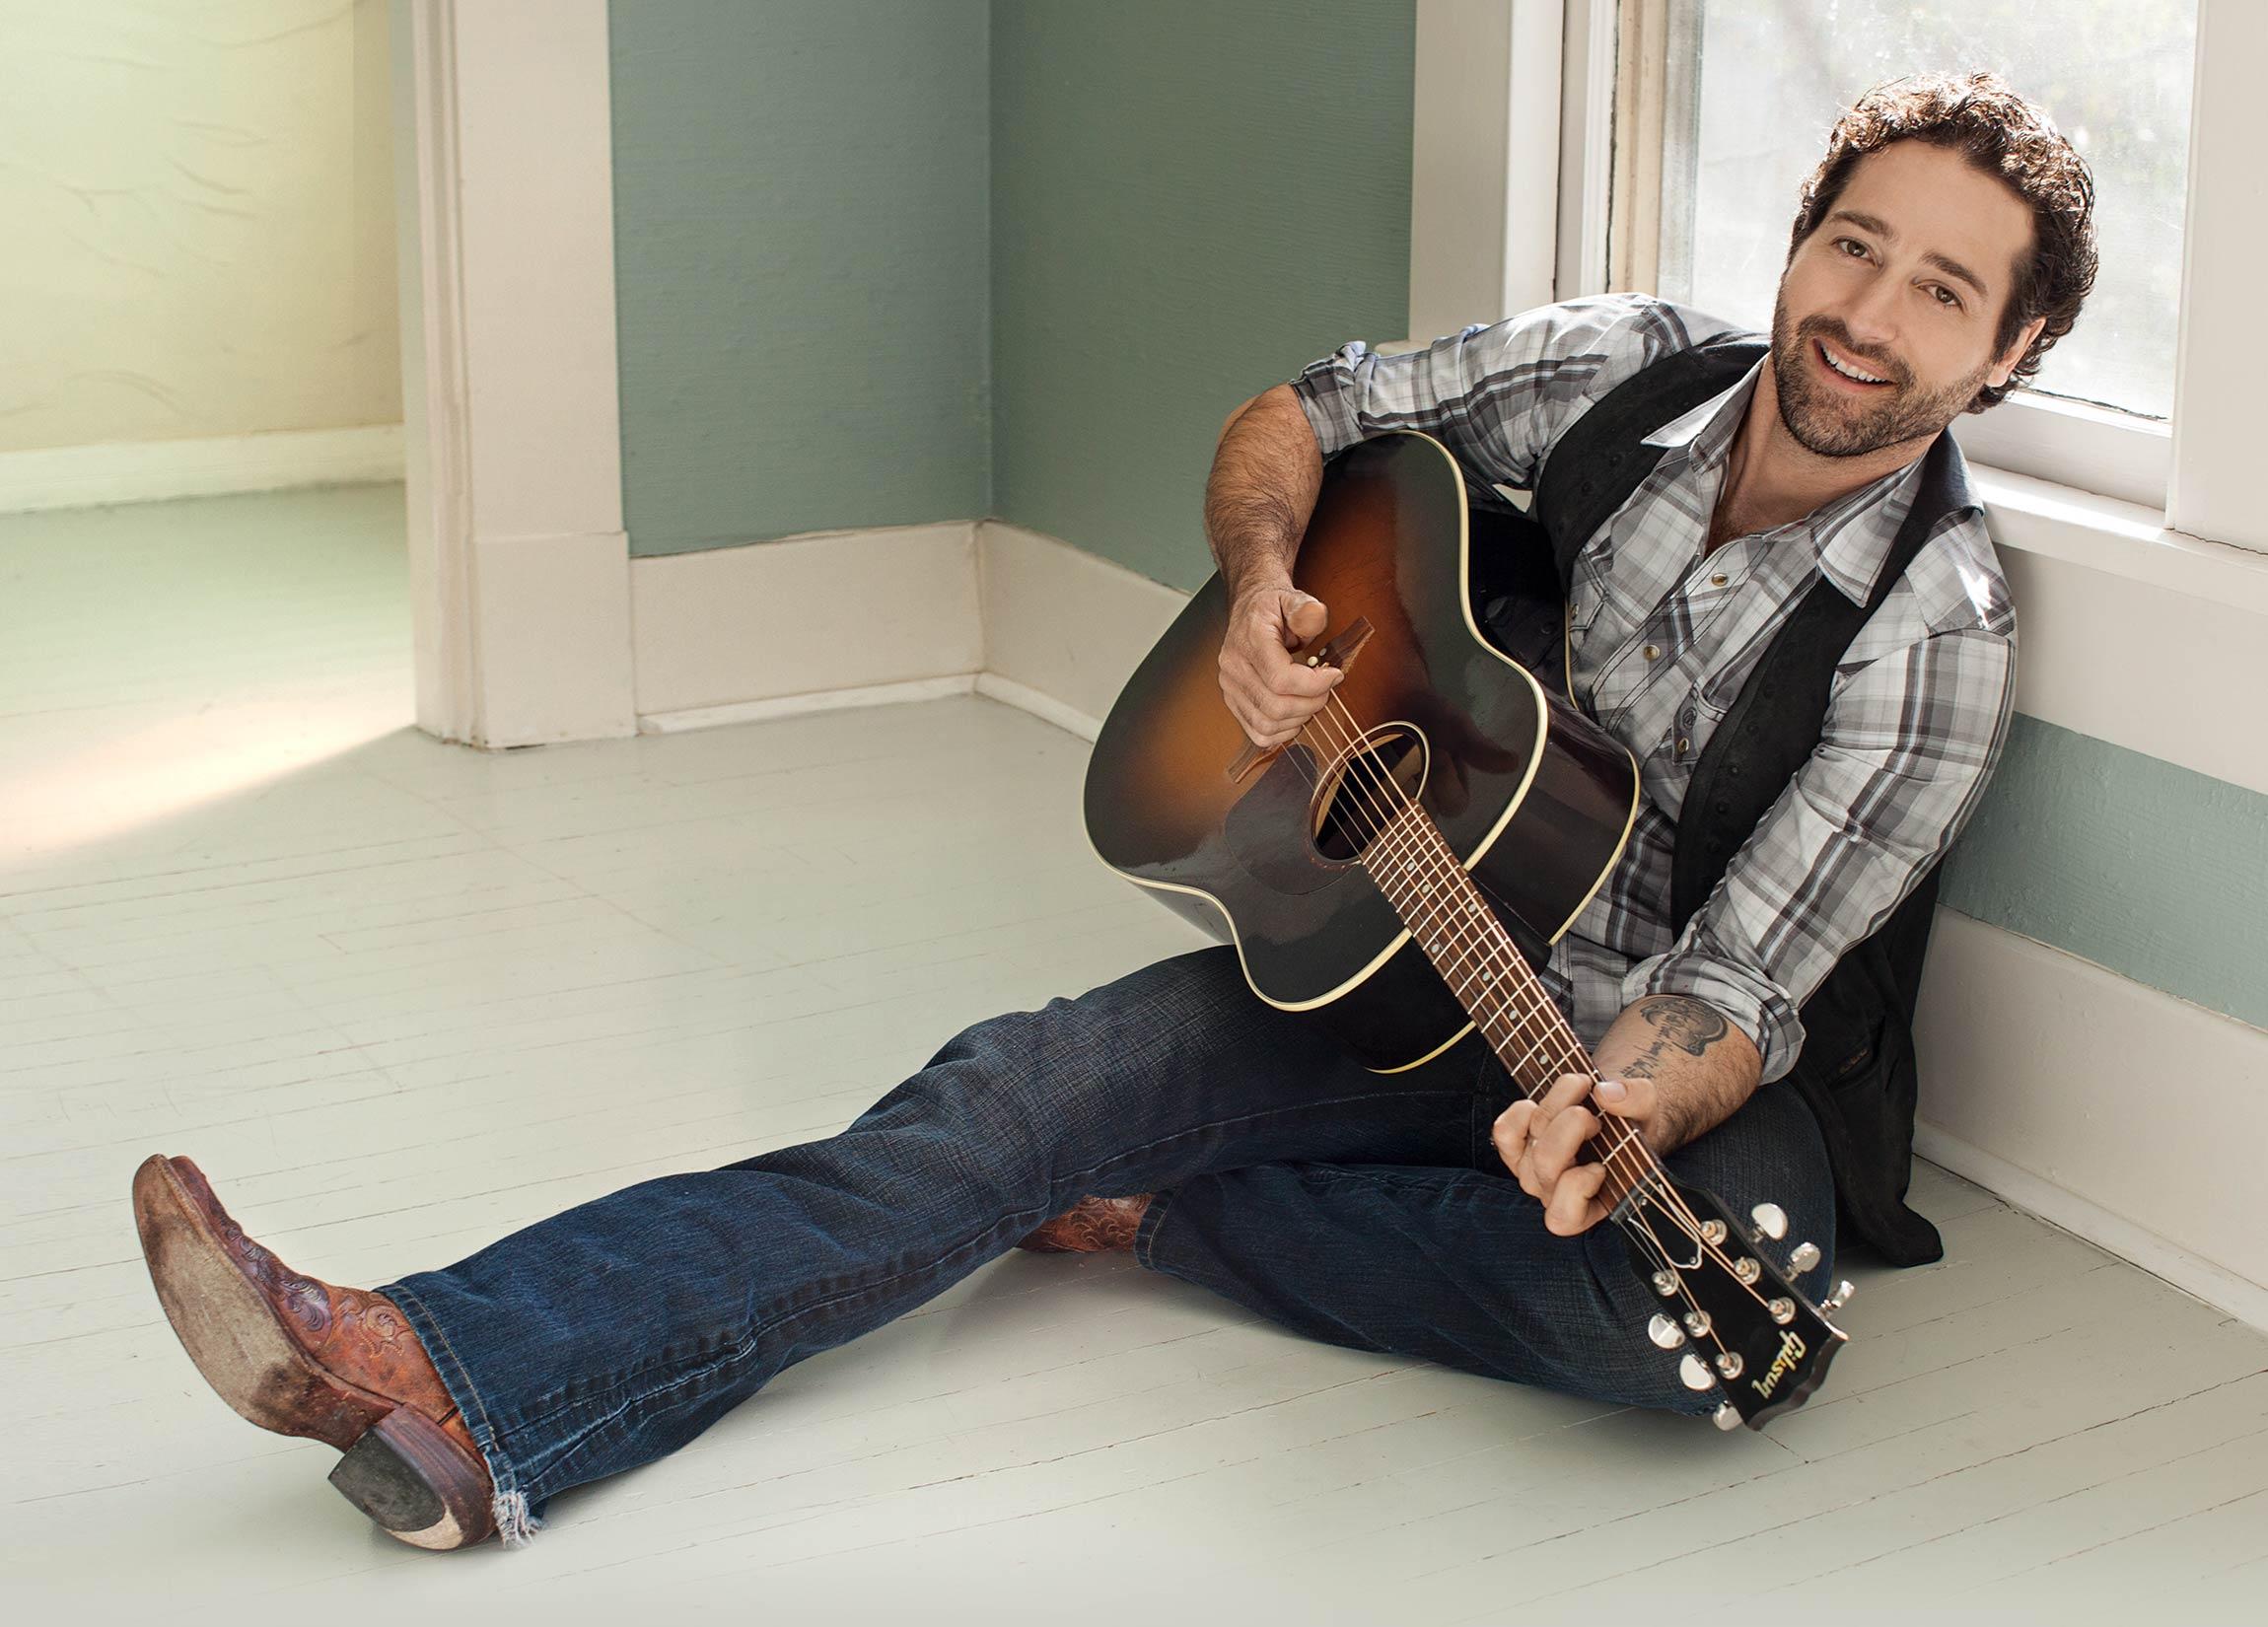 Country singer/songwriter Josh Thompson will play the Seneca Niagara Bear's Den on Jan. 28.